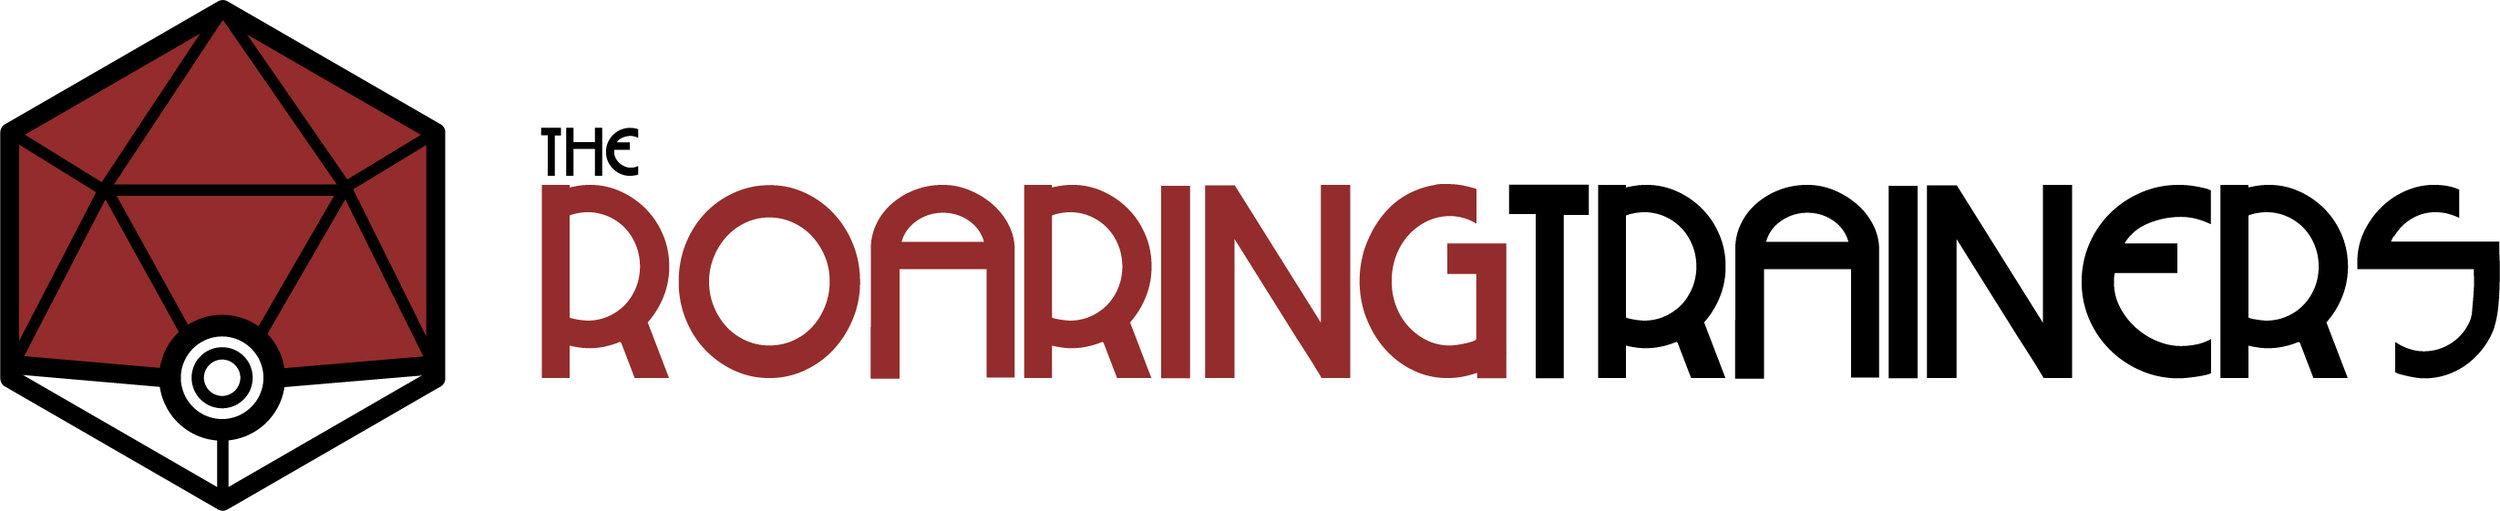 TheRoaringTrainers_Logo_v1.jpg